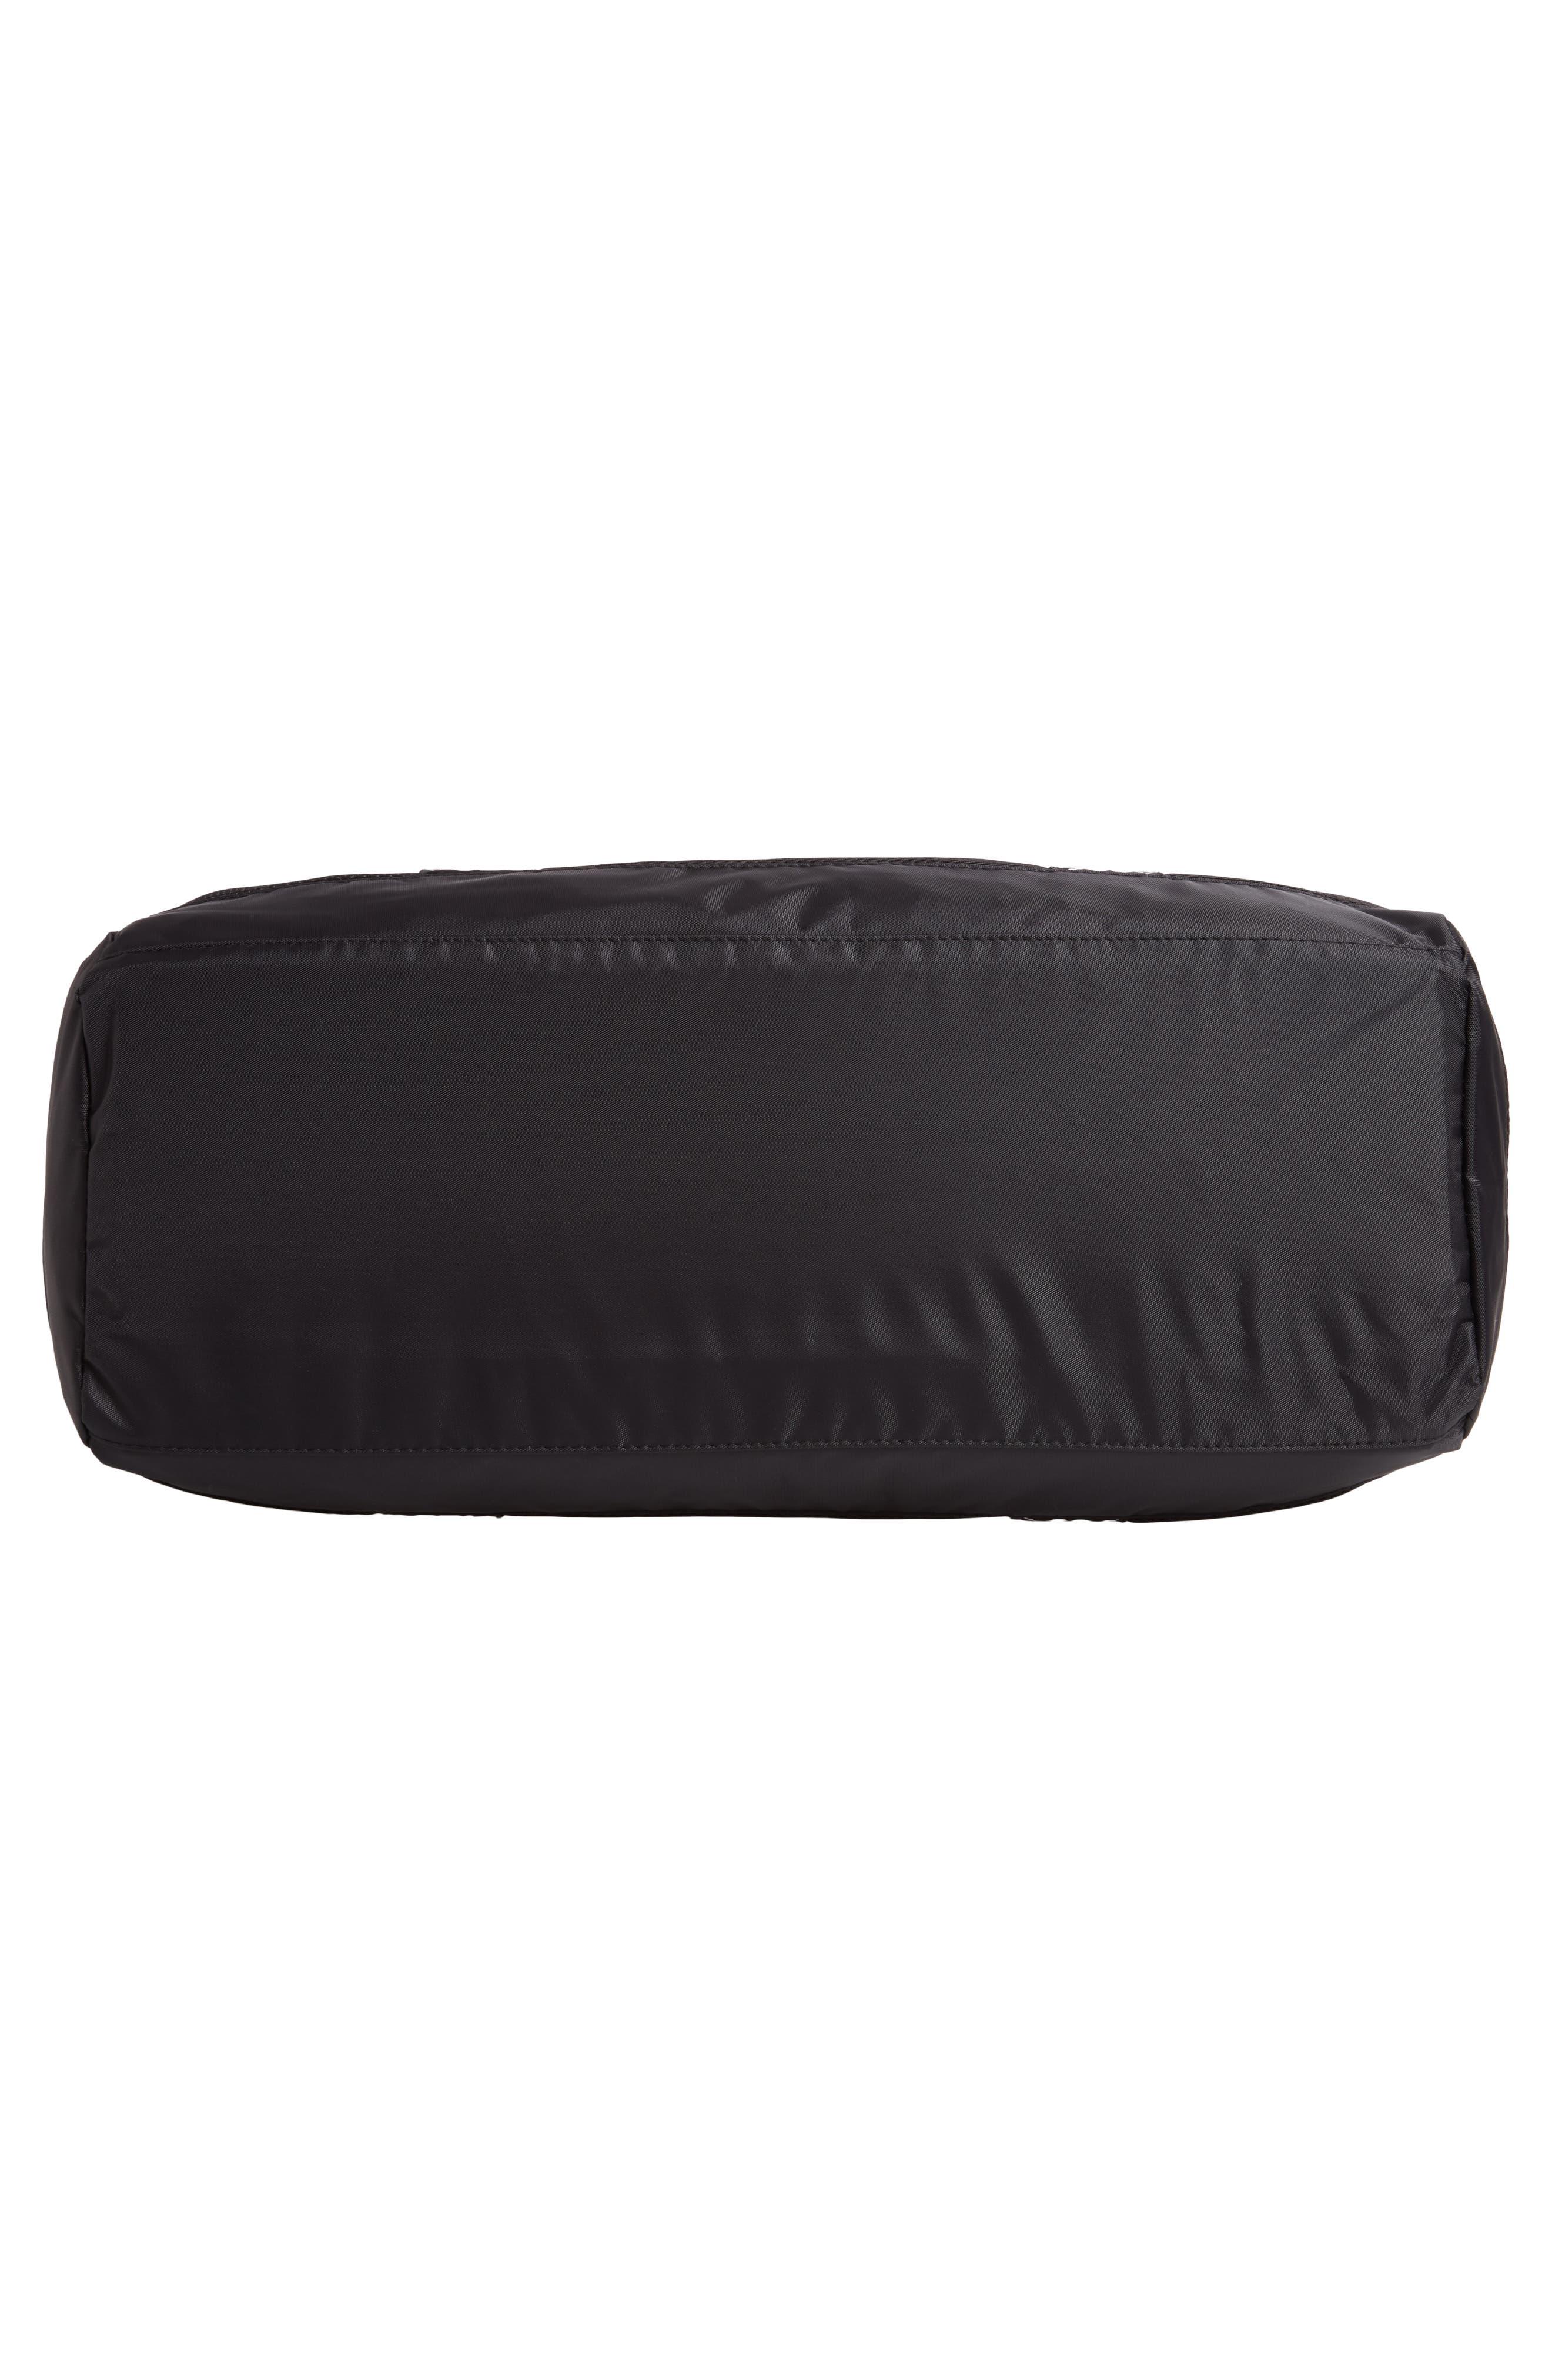 XL Athletic Duffel Bag,                             Alternate thumbnail 6, color,                             BLACK-WHITE